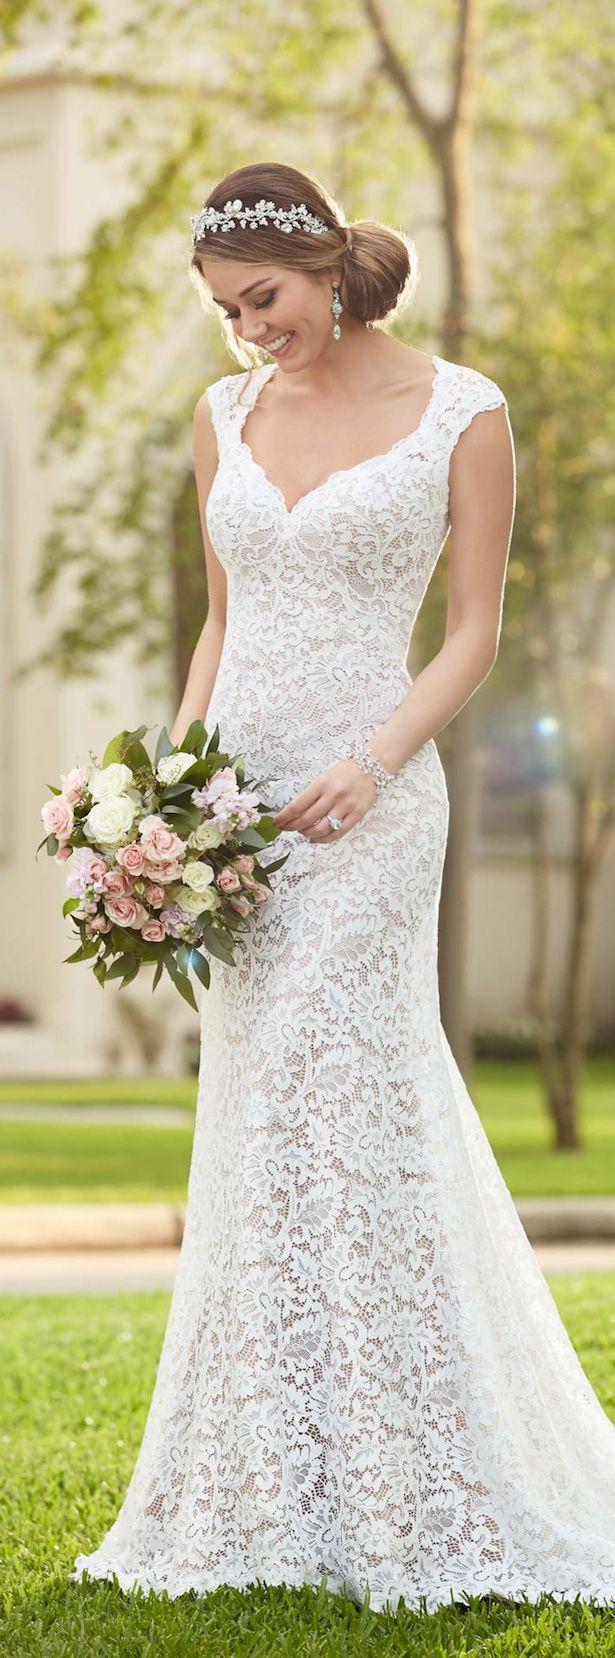 Stella+York+Spring+2016+Wedding+Dress